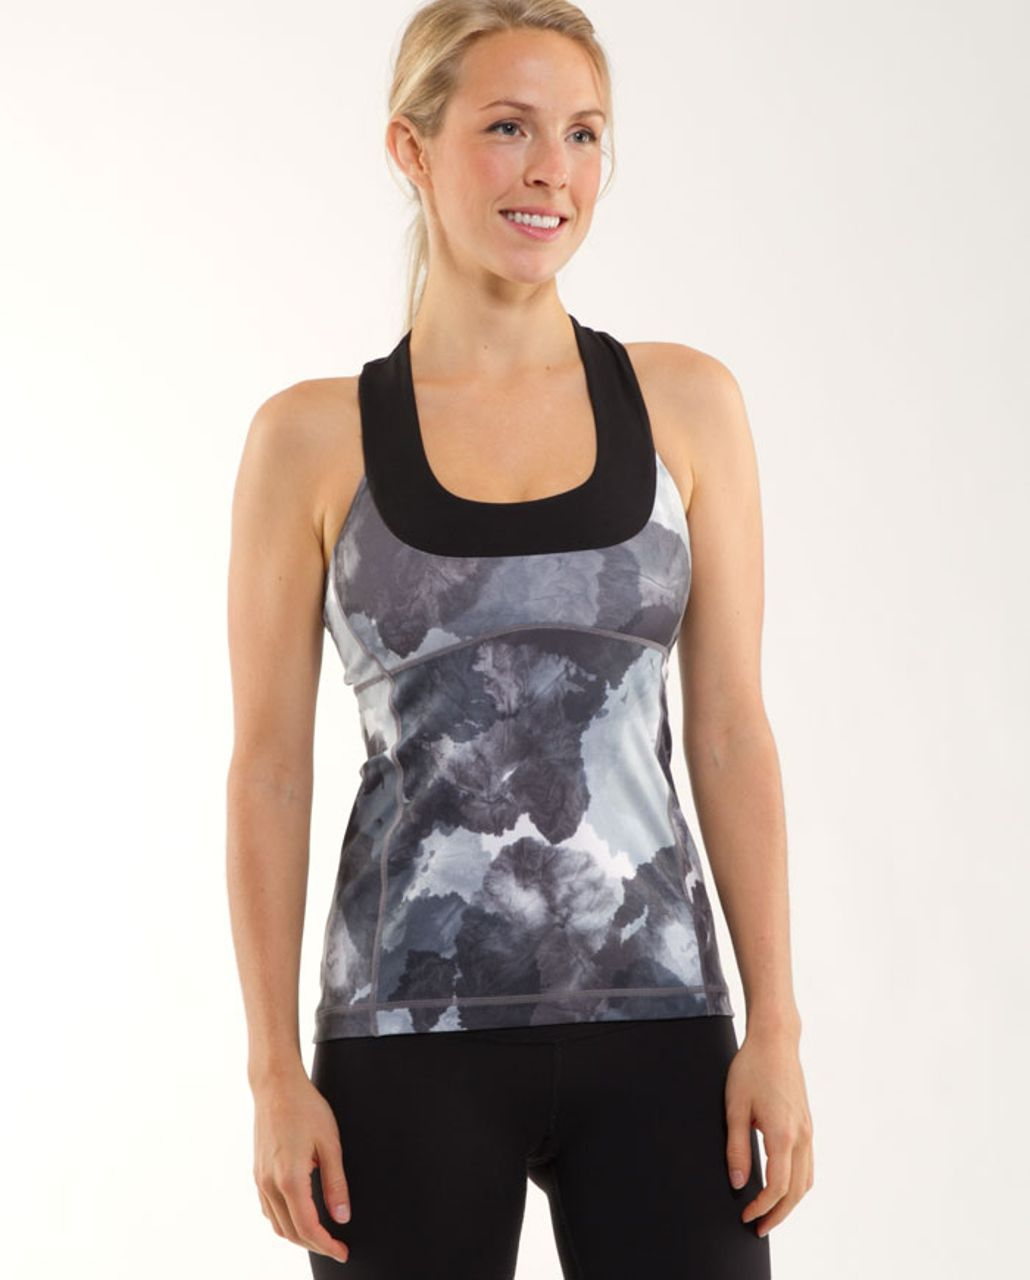 Lululemon Scoop Neck Tank - Black /  White Coal Tinted Canvas Super